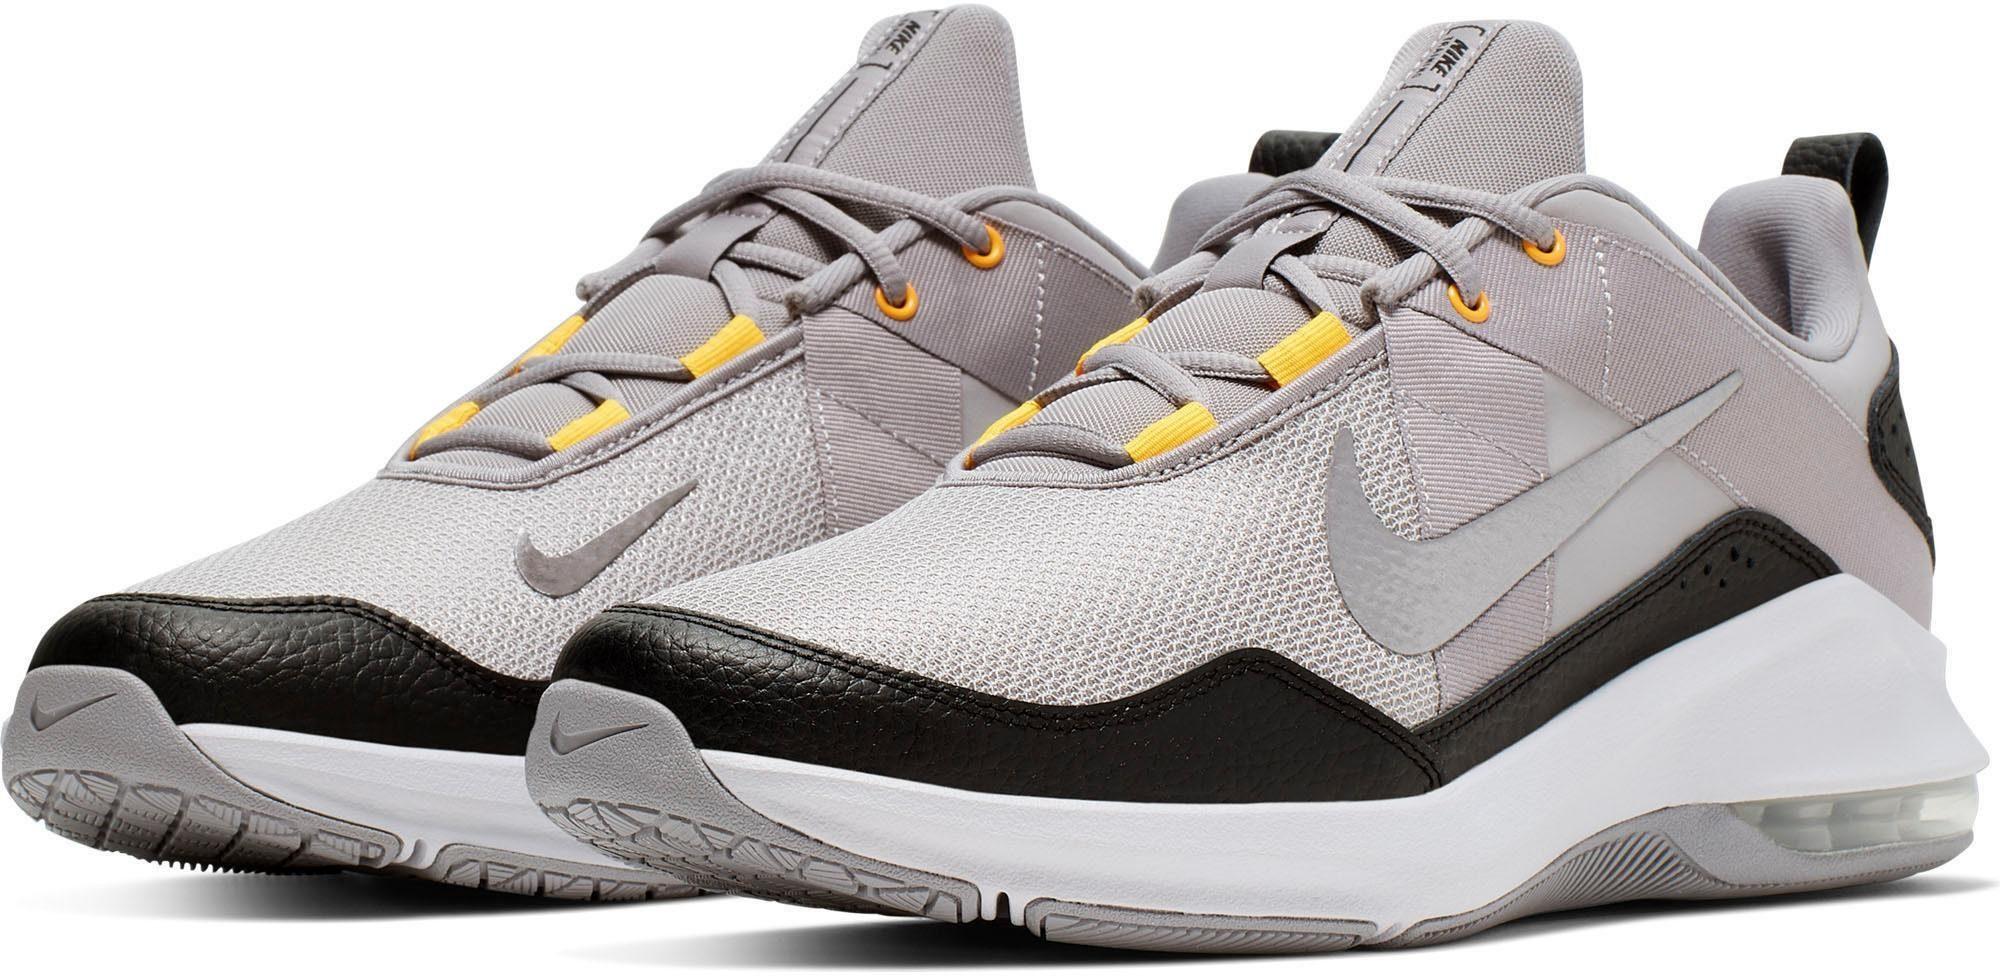 Nike »Air Max Alpha Trainer 2« Trainingsschuh, Atmungsaktives Obermaterial aus Textil und Synthetik online kaufen | OTTO